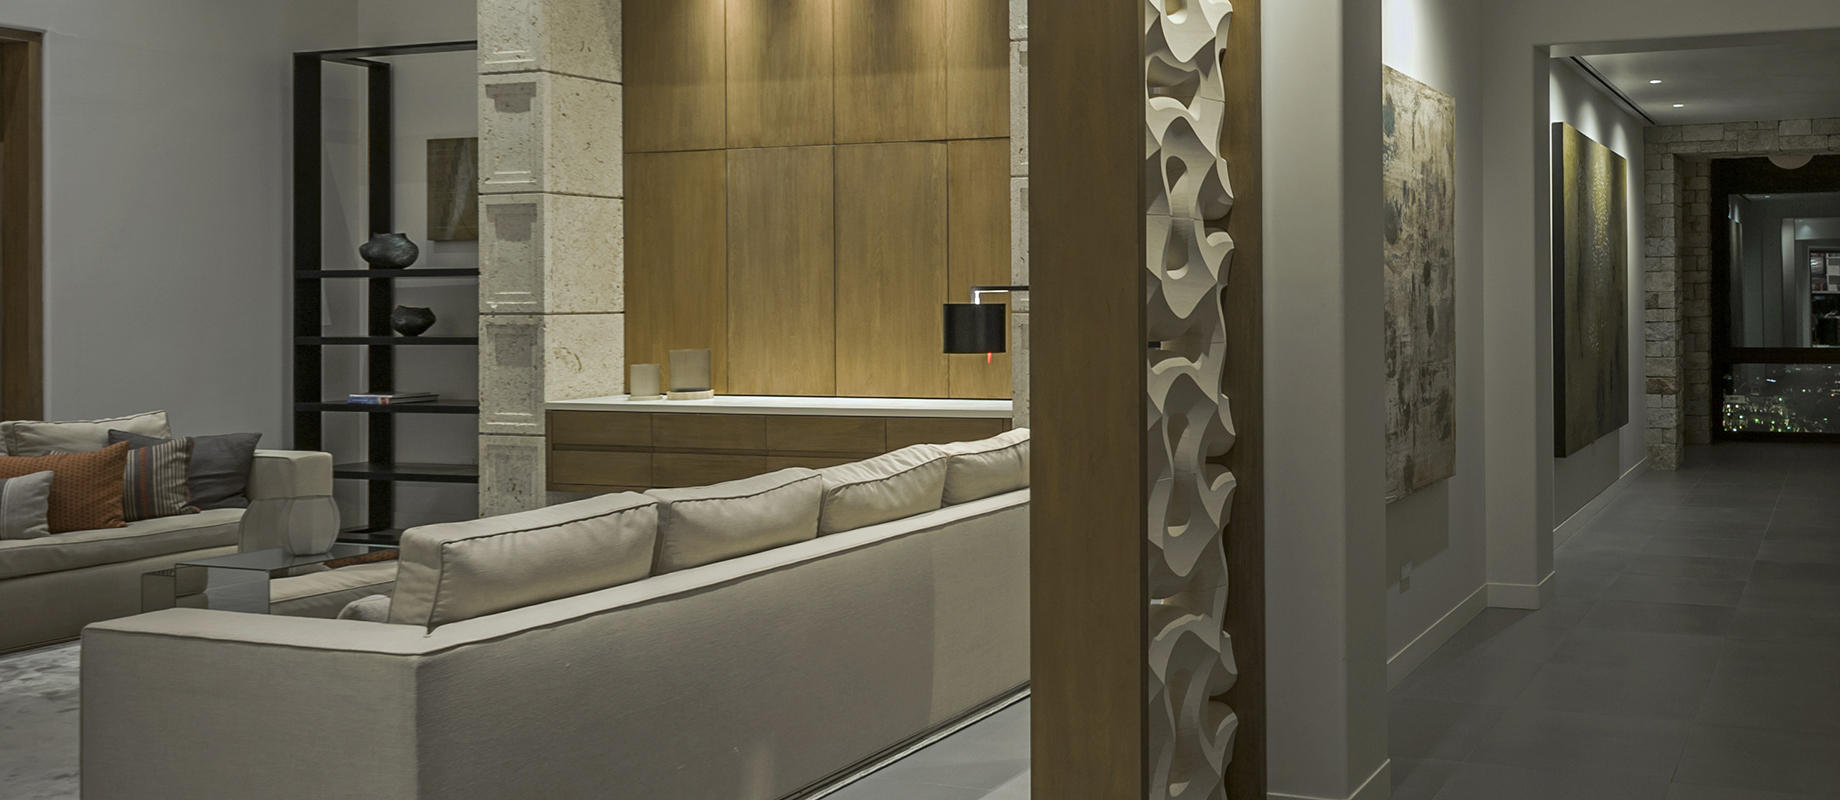 LithosDesign_traccia_marble_rom_divider_for_interiors_